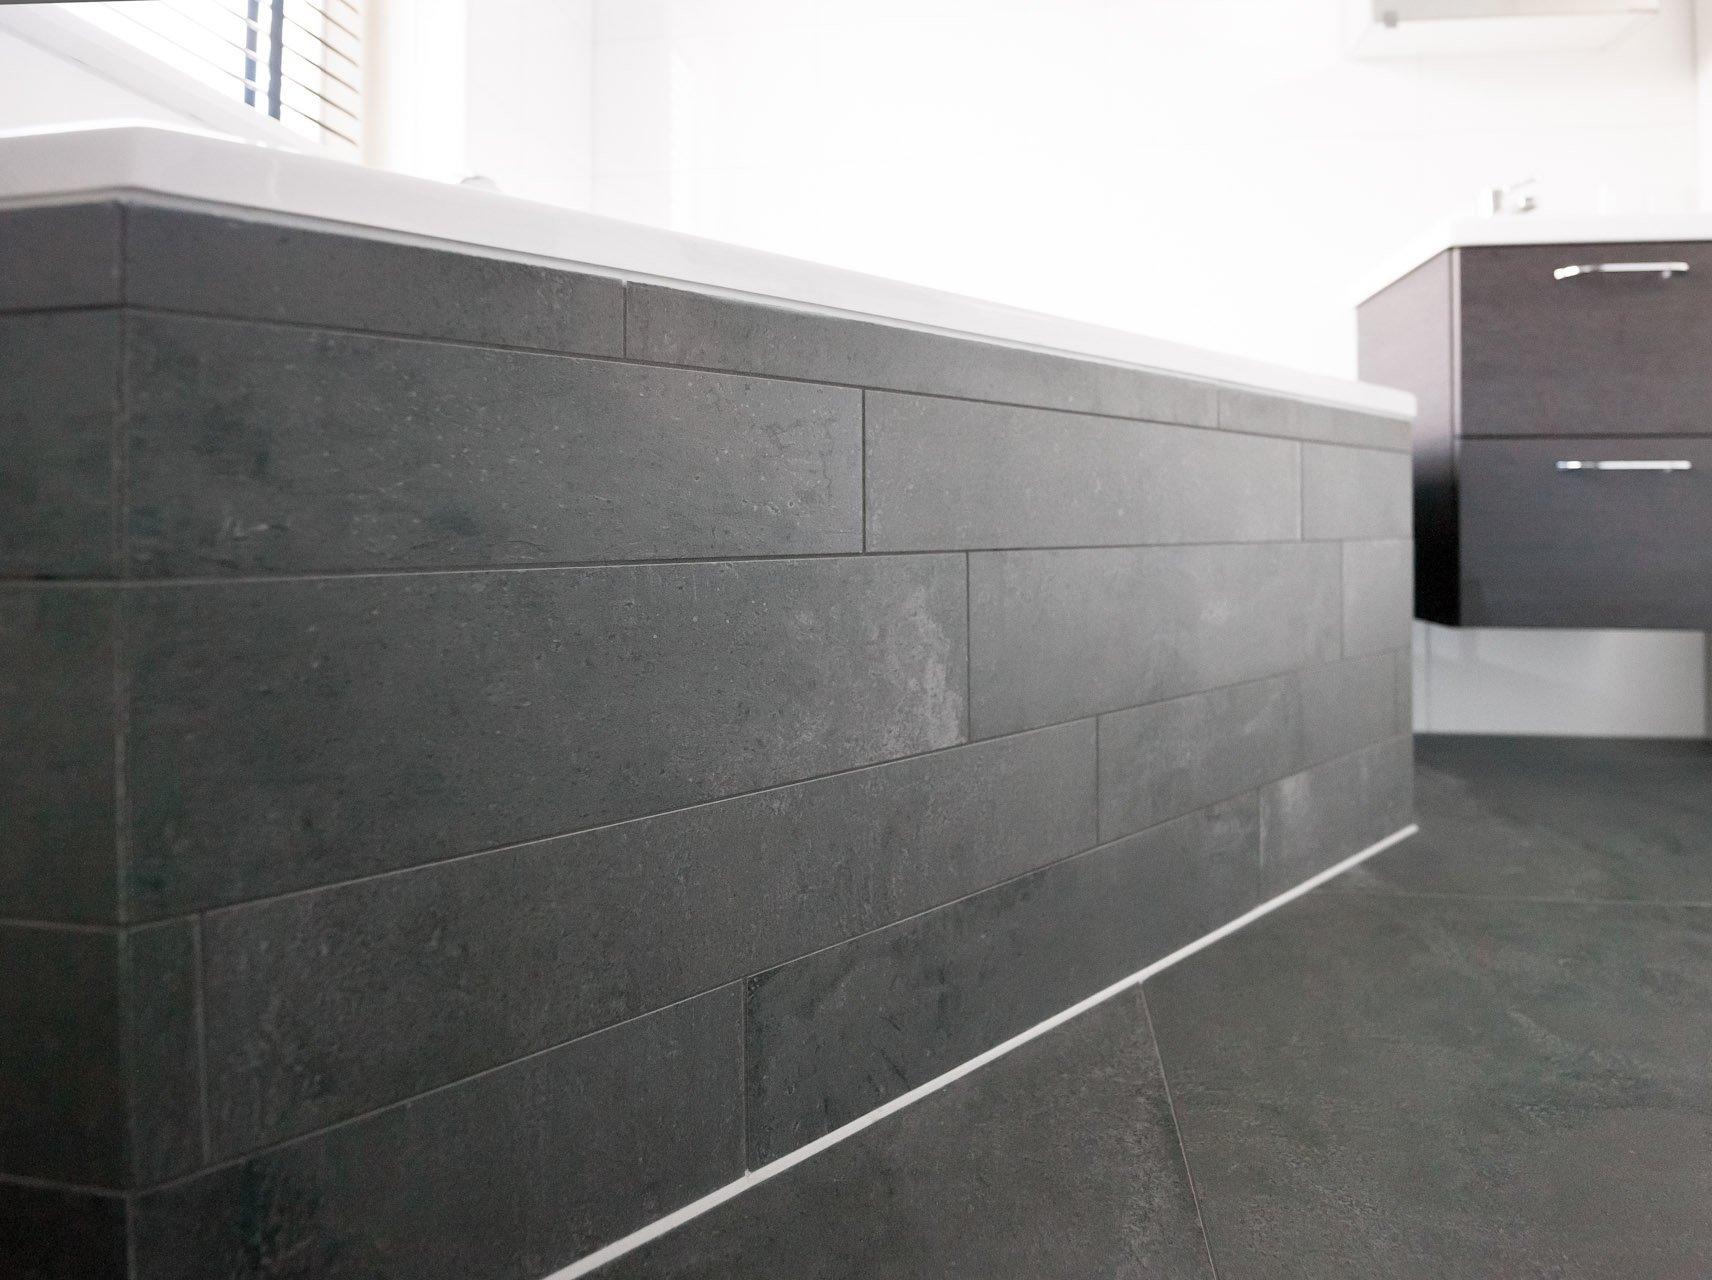 Antraciet vloertegels in woonkamer en badkamer